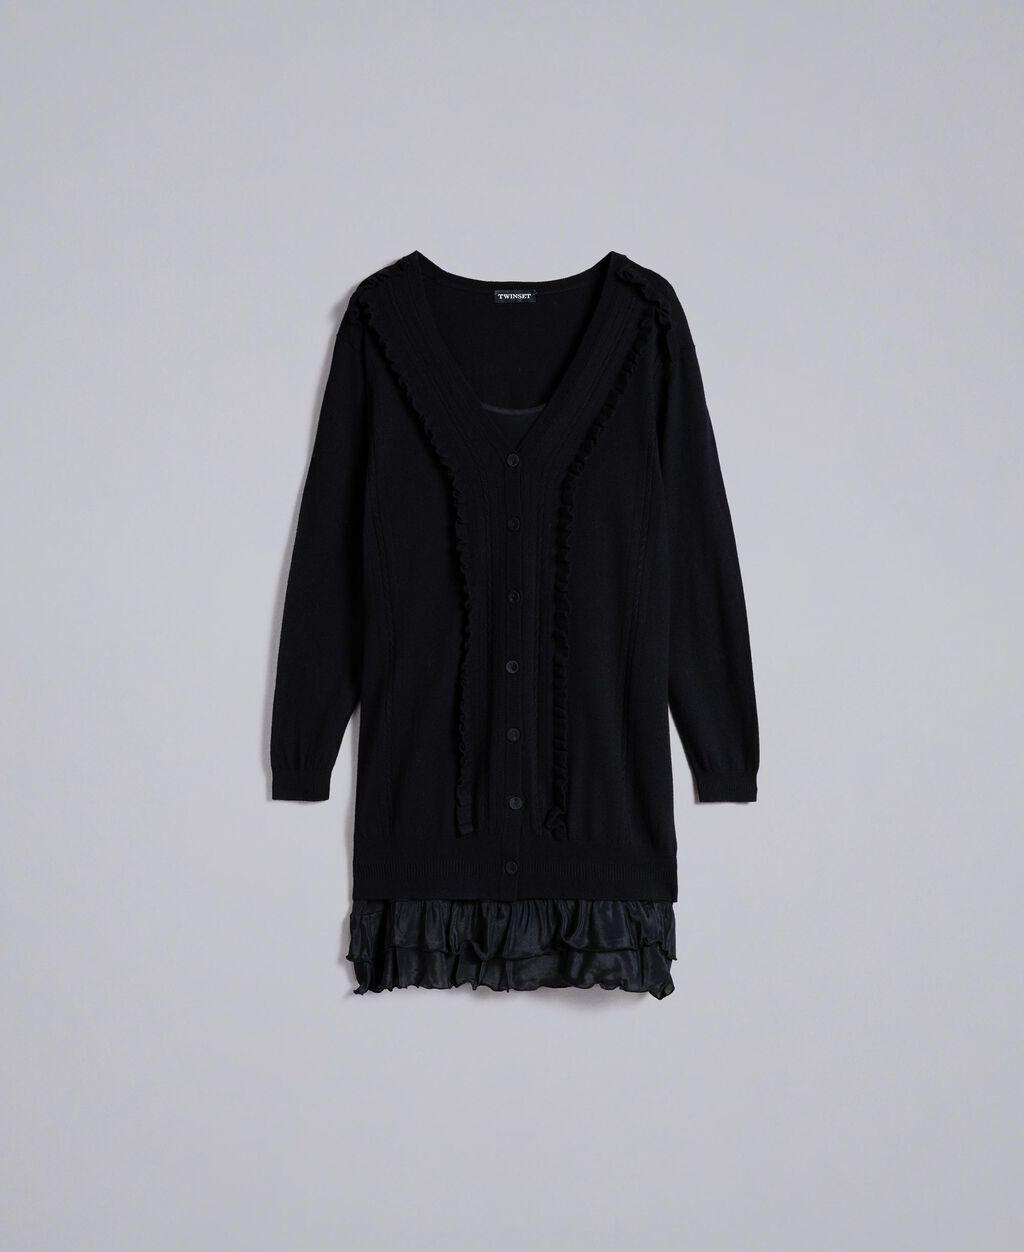 afaa66f768e Robe en laine et cachemire avec fond de robe Femme